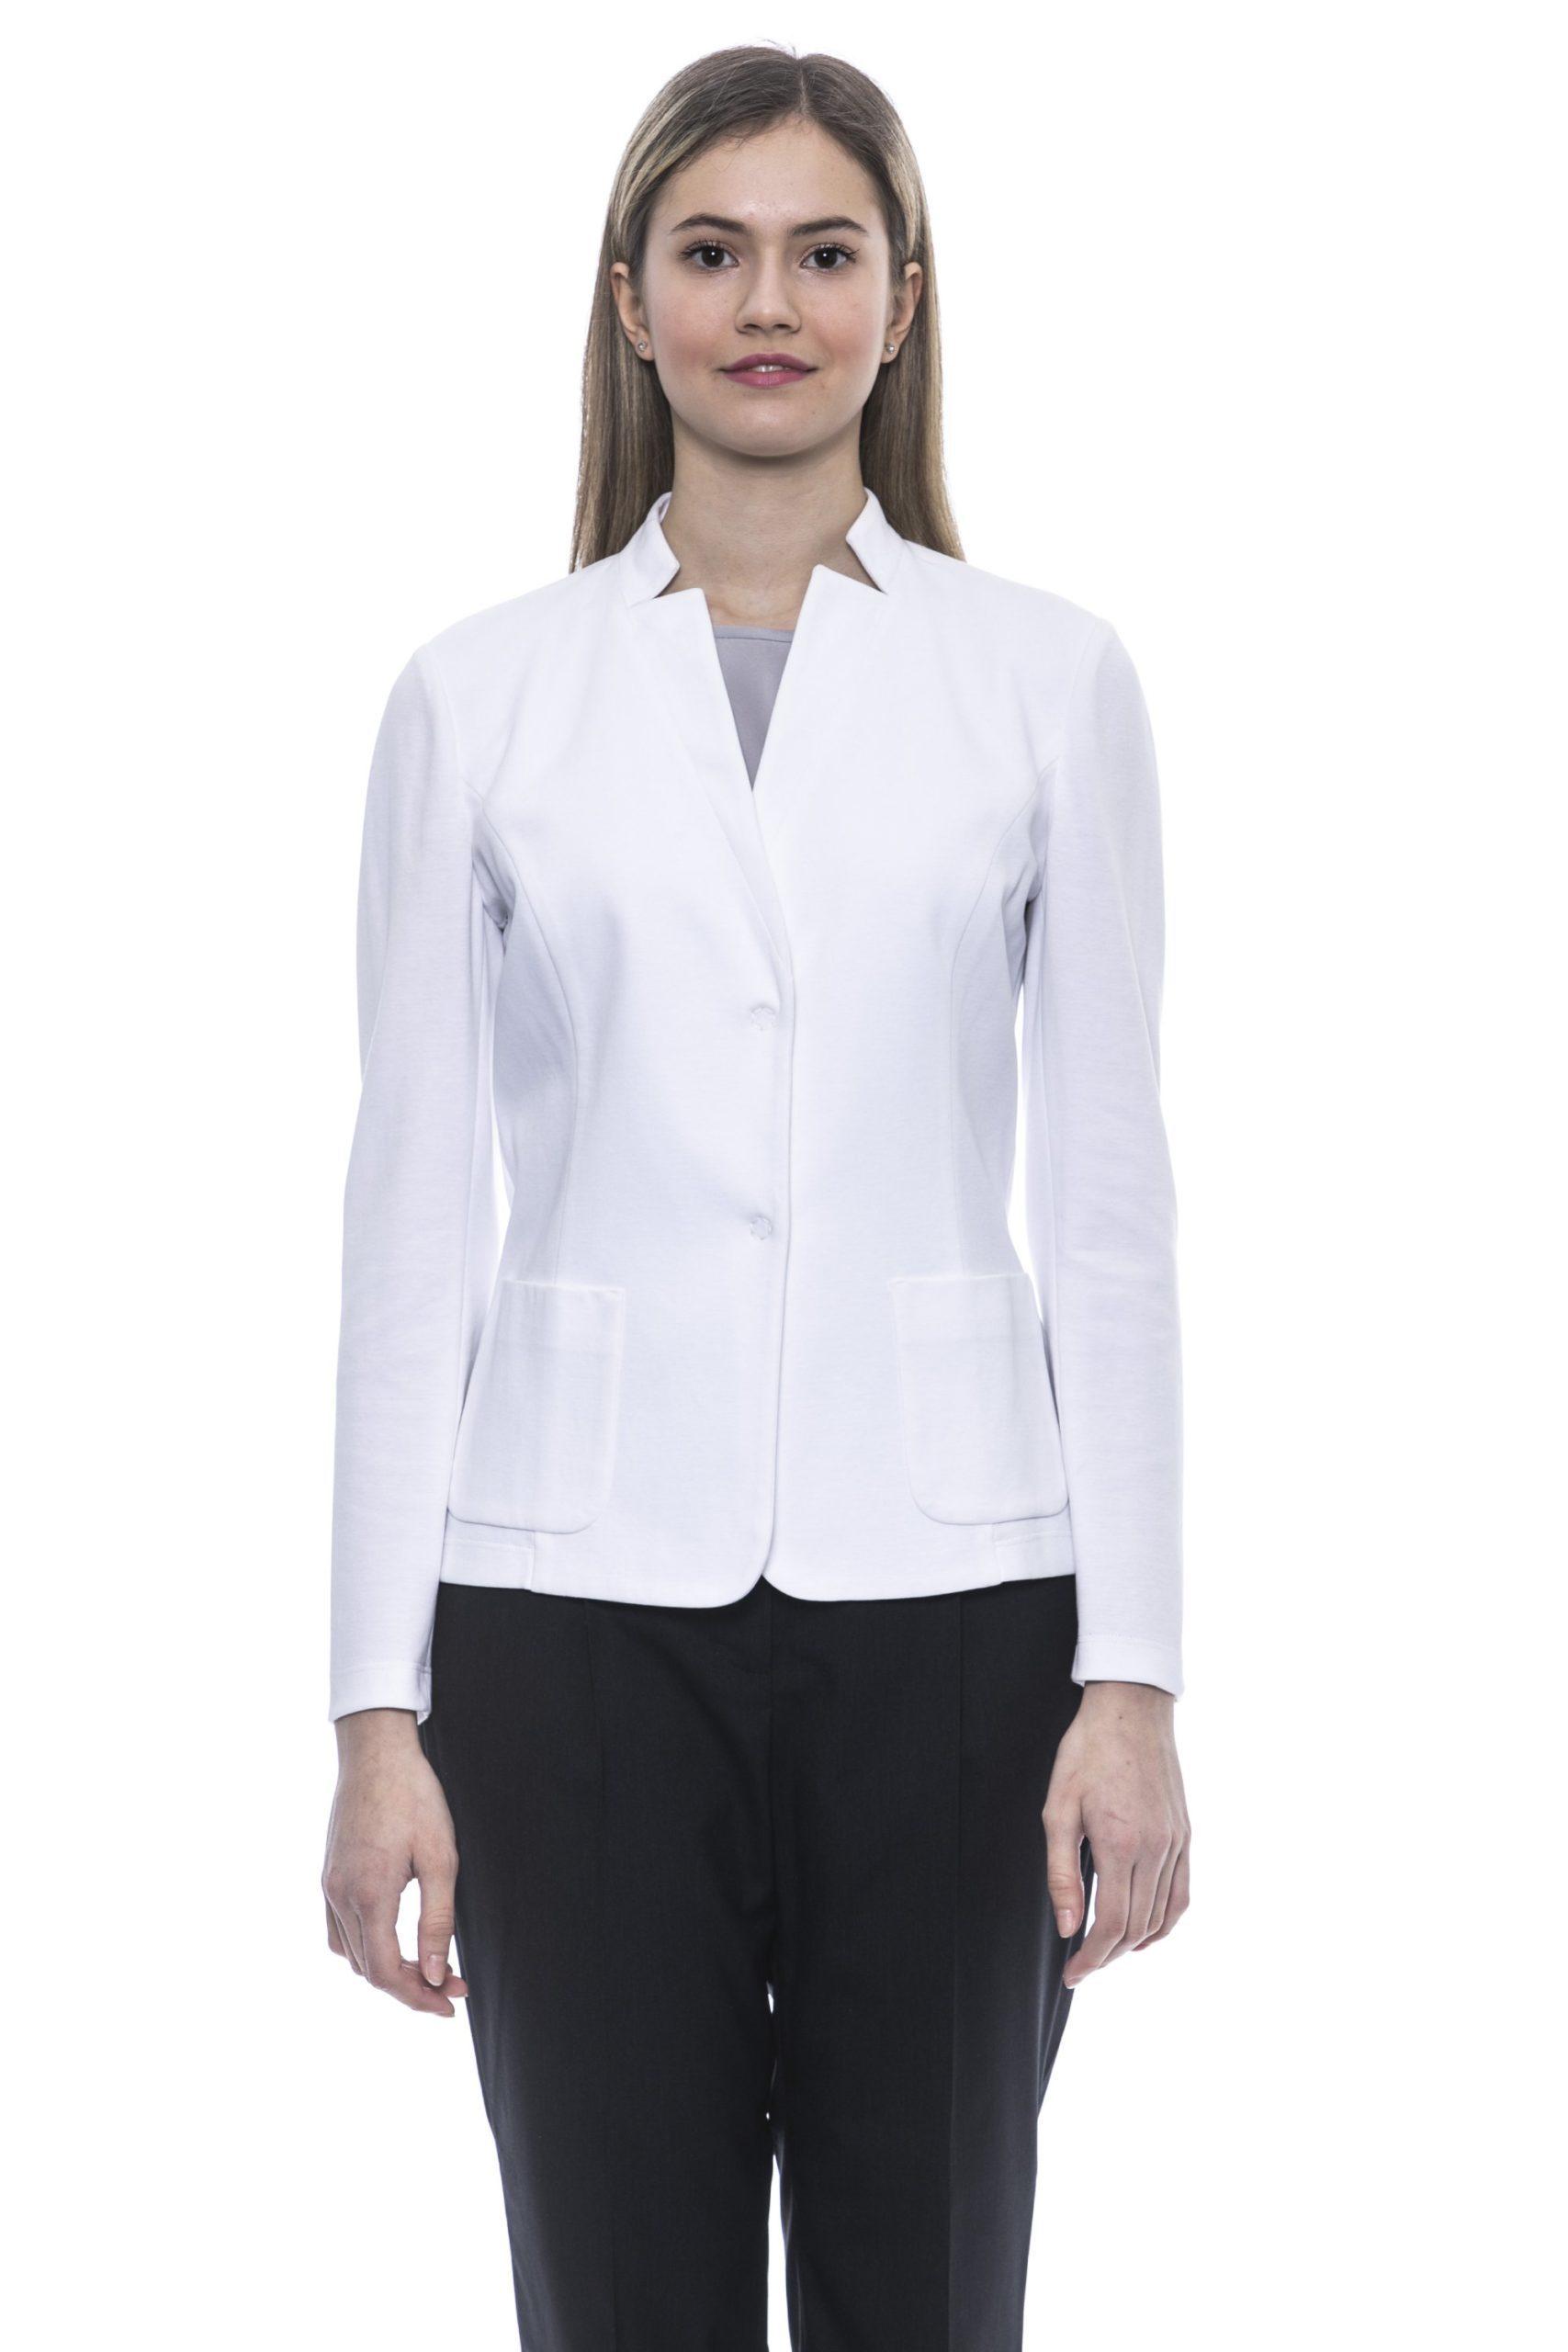 Peserico Women's Bianco Blazer White PE1383331 - IT42 | S